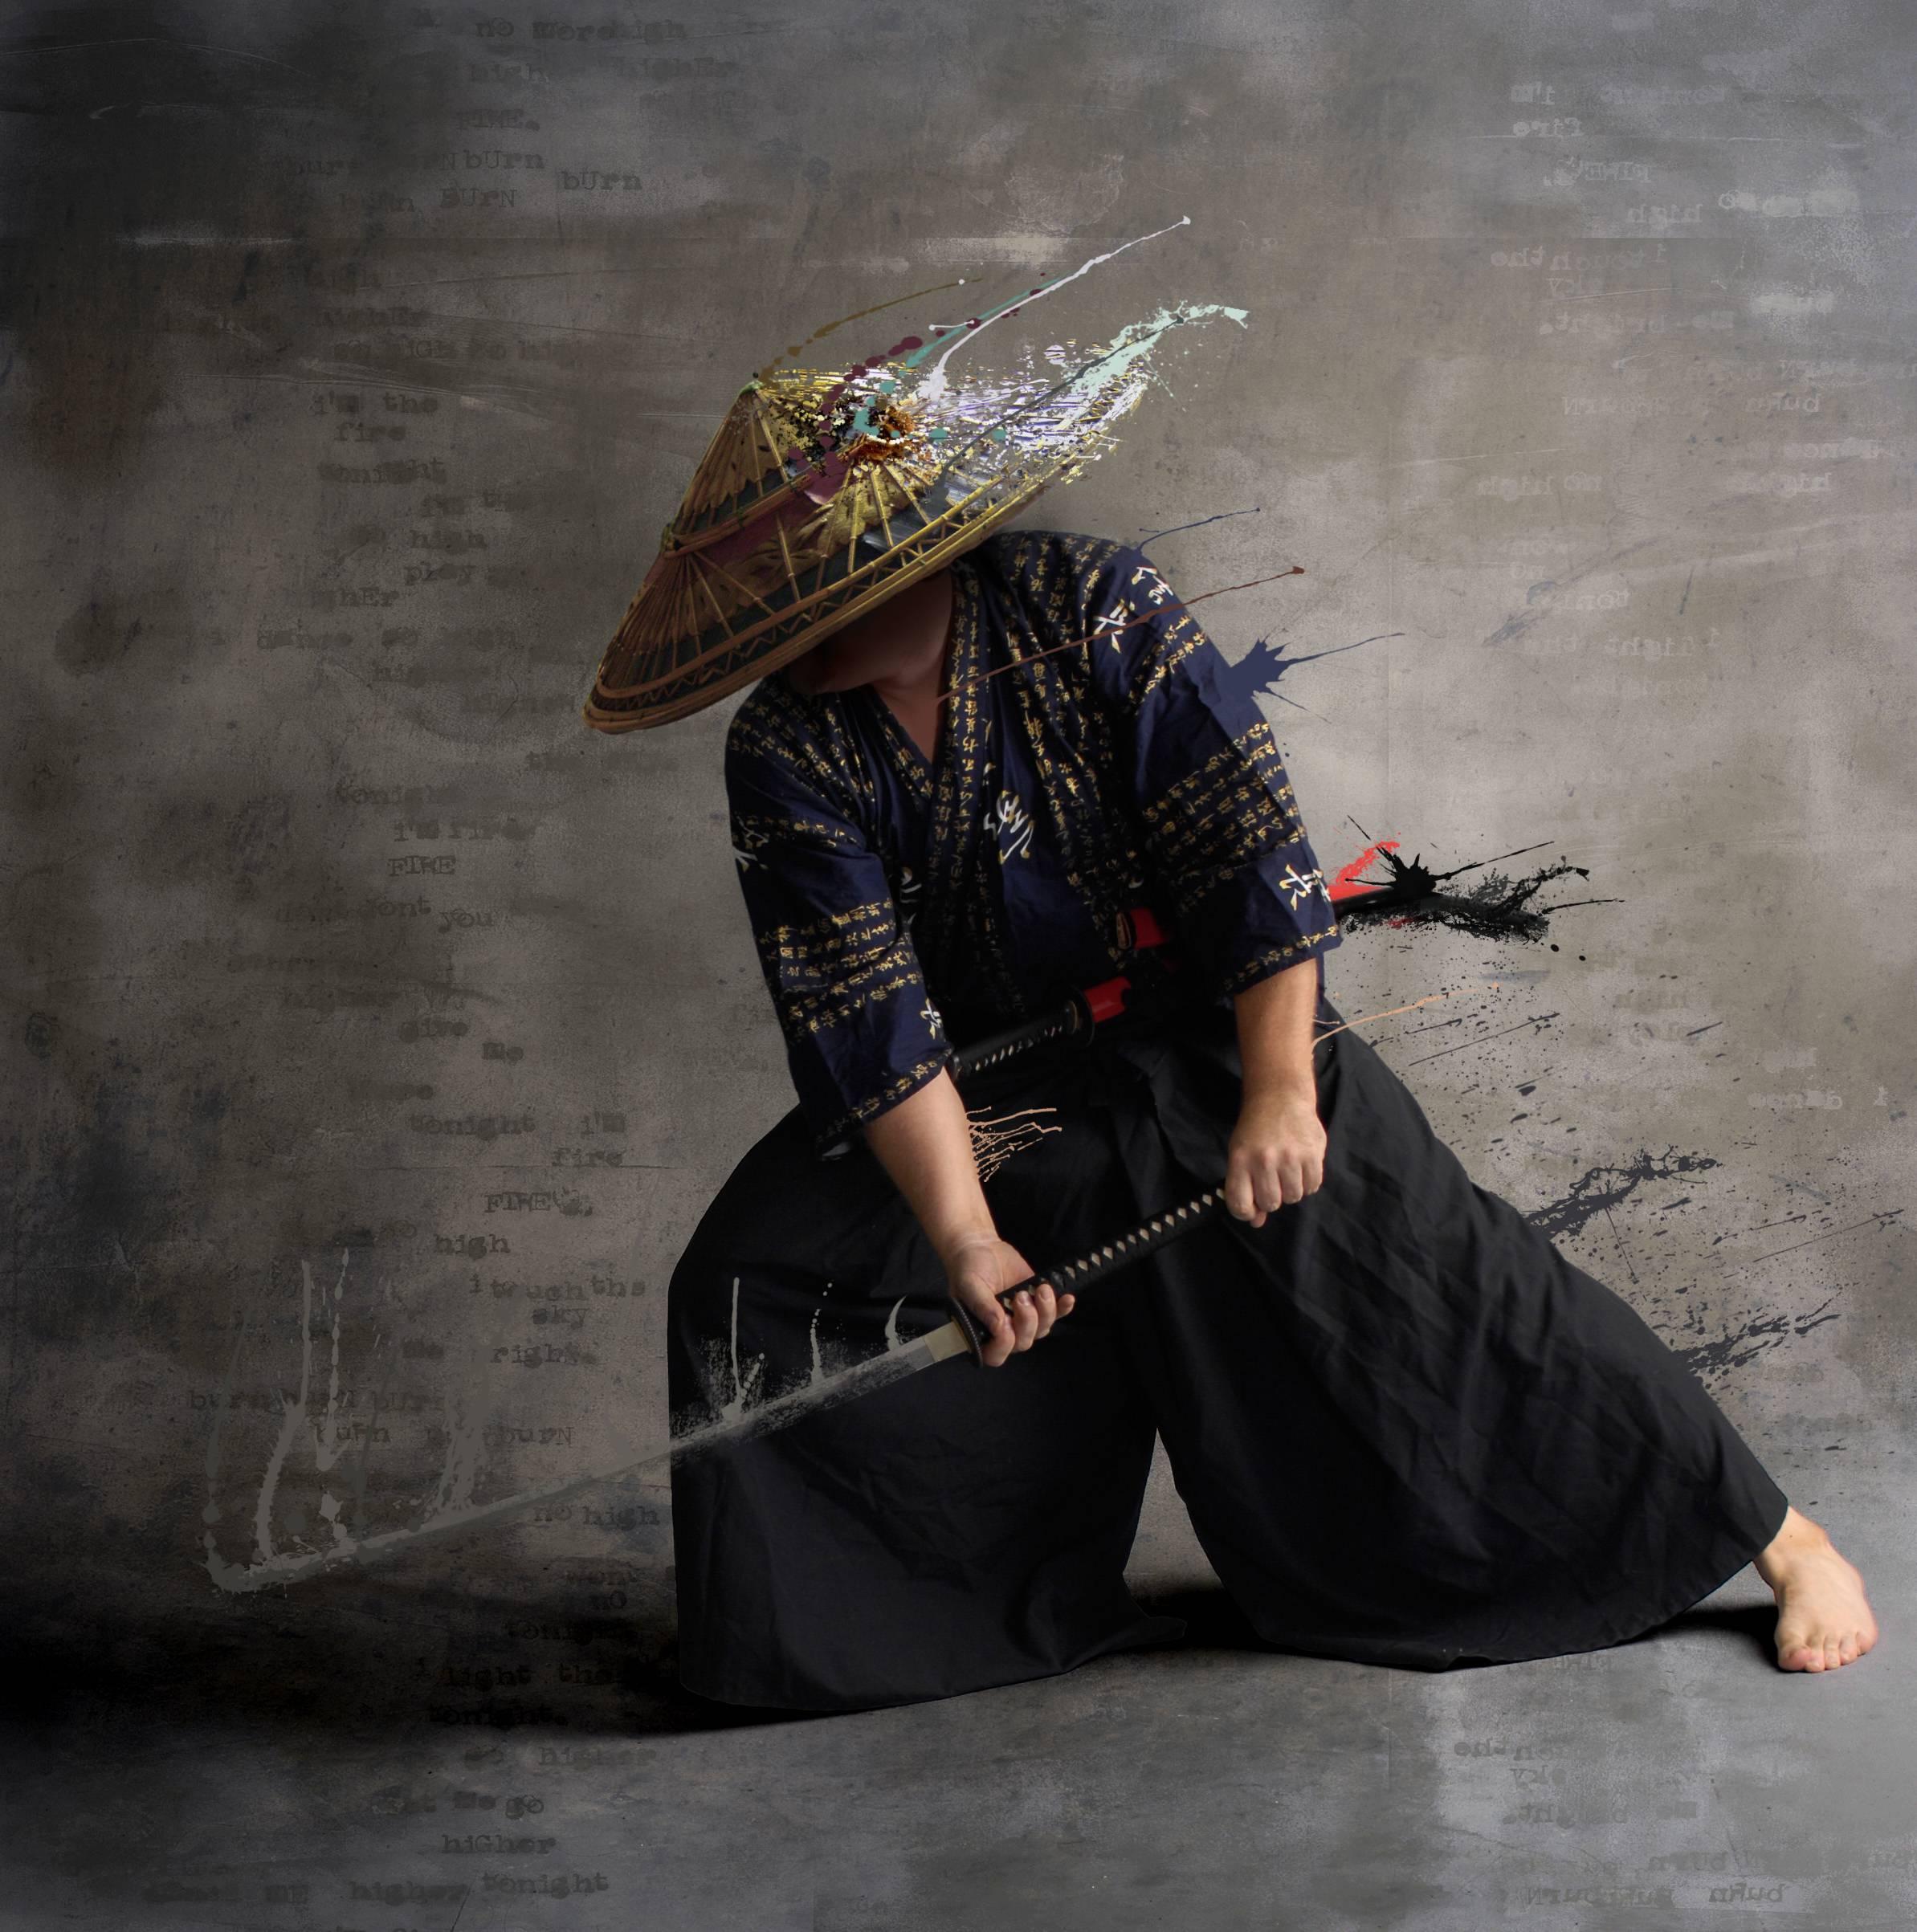 30 samurai wallpapers hd - photo #18